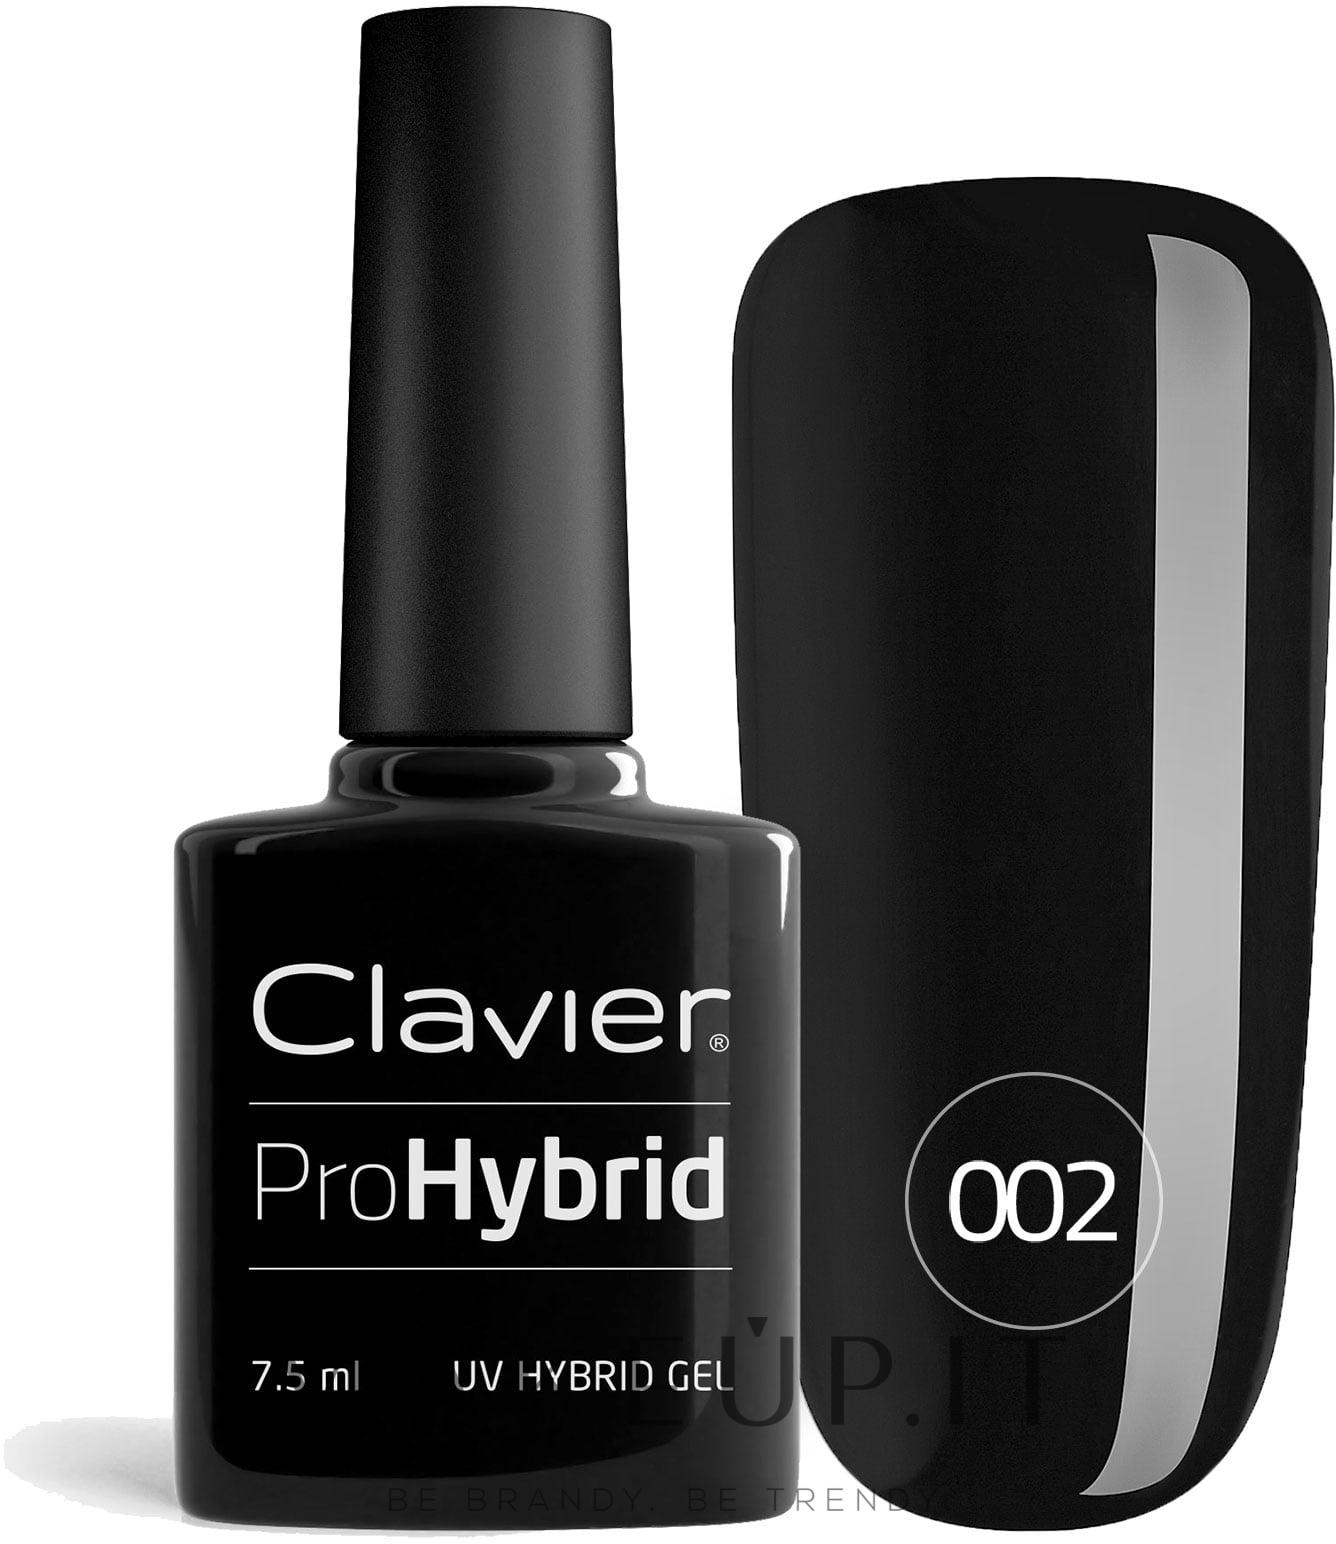 Gel UV - Clavier ProHybrid UV Hybrid Gel — foto 002